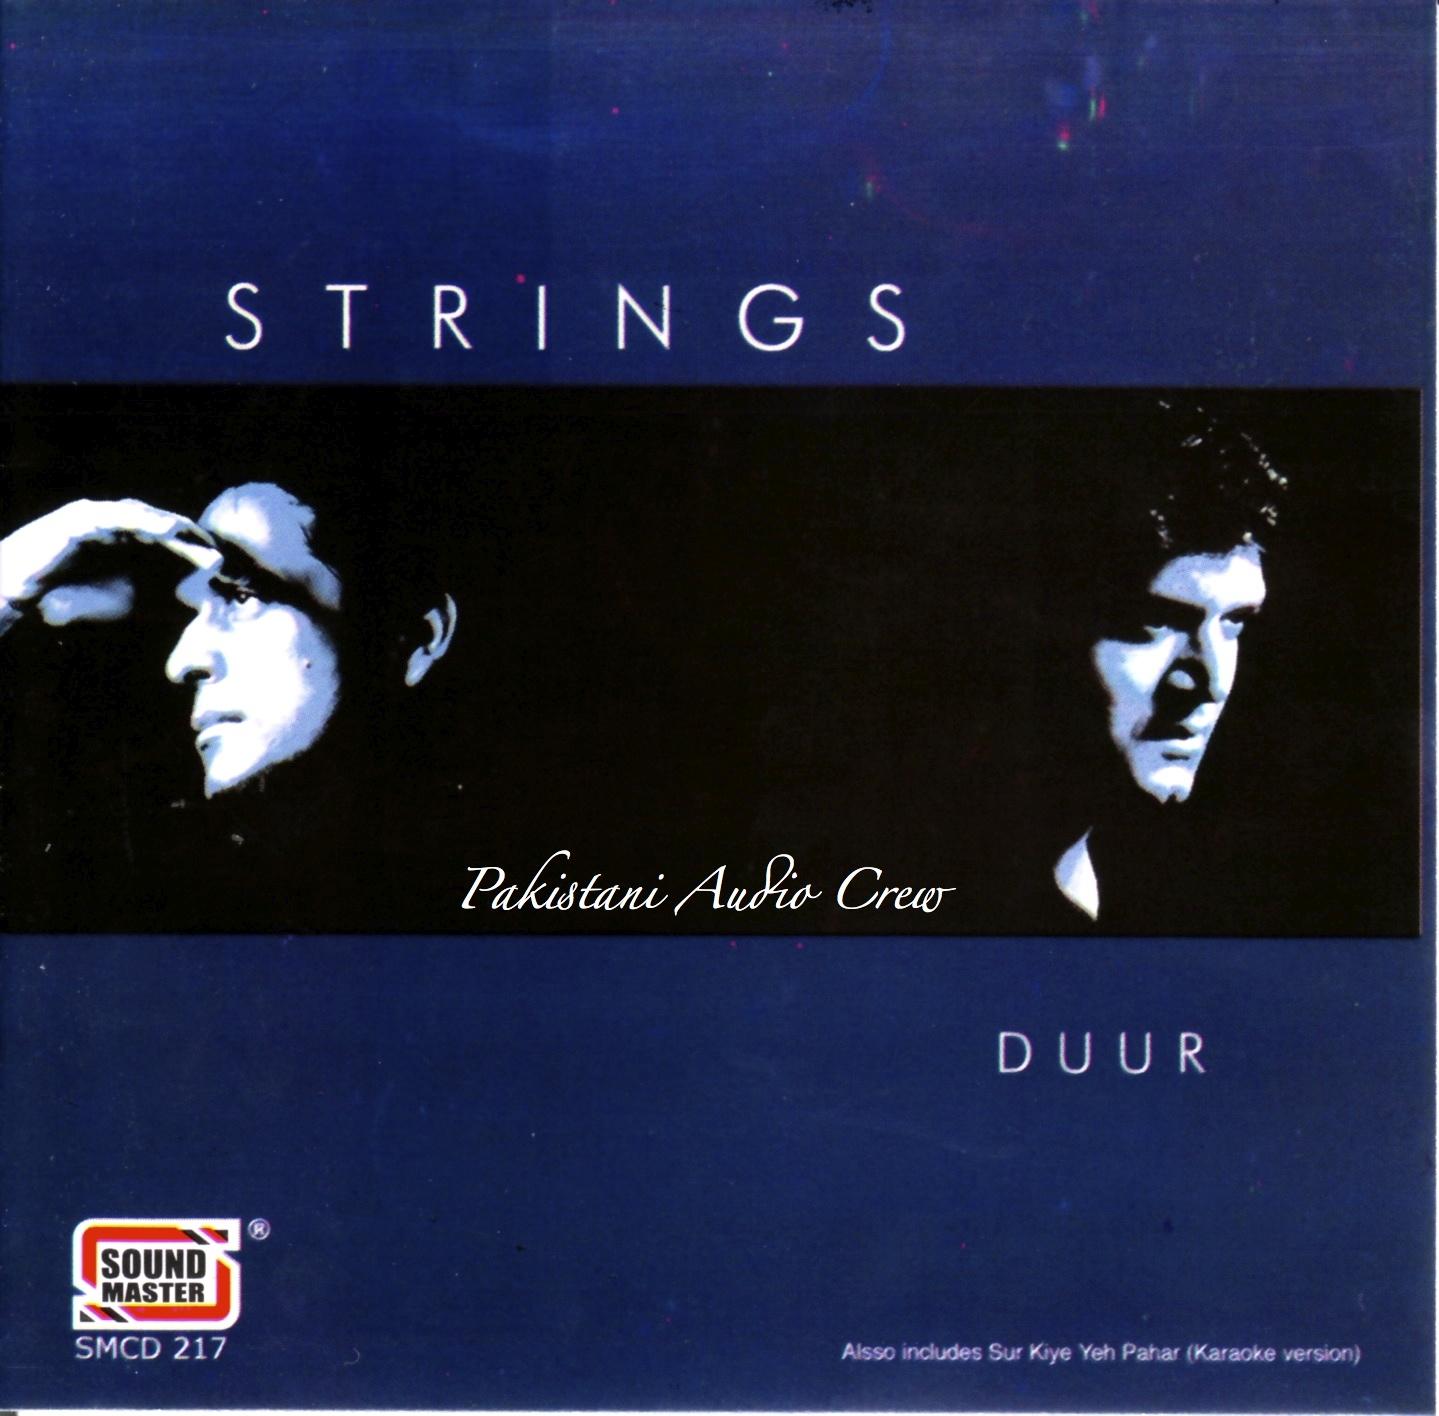 Koi Puche Mere Dilse Mp3 Song Downlode: Muzikeye: Strings [1990 To 2008-MP3-VBR-320Kbps]